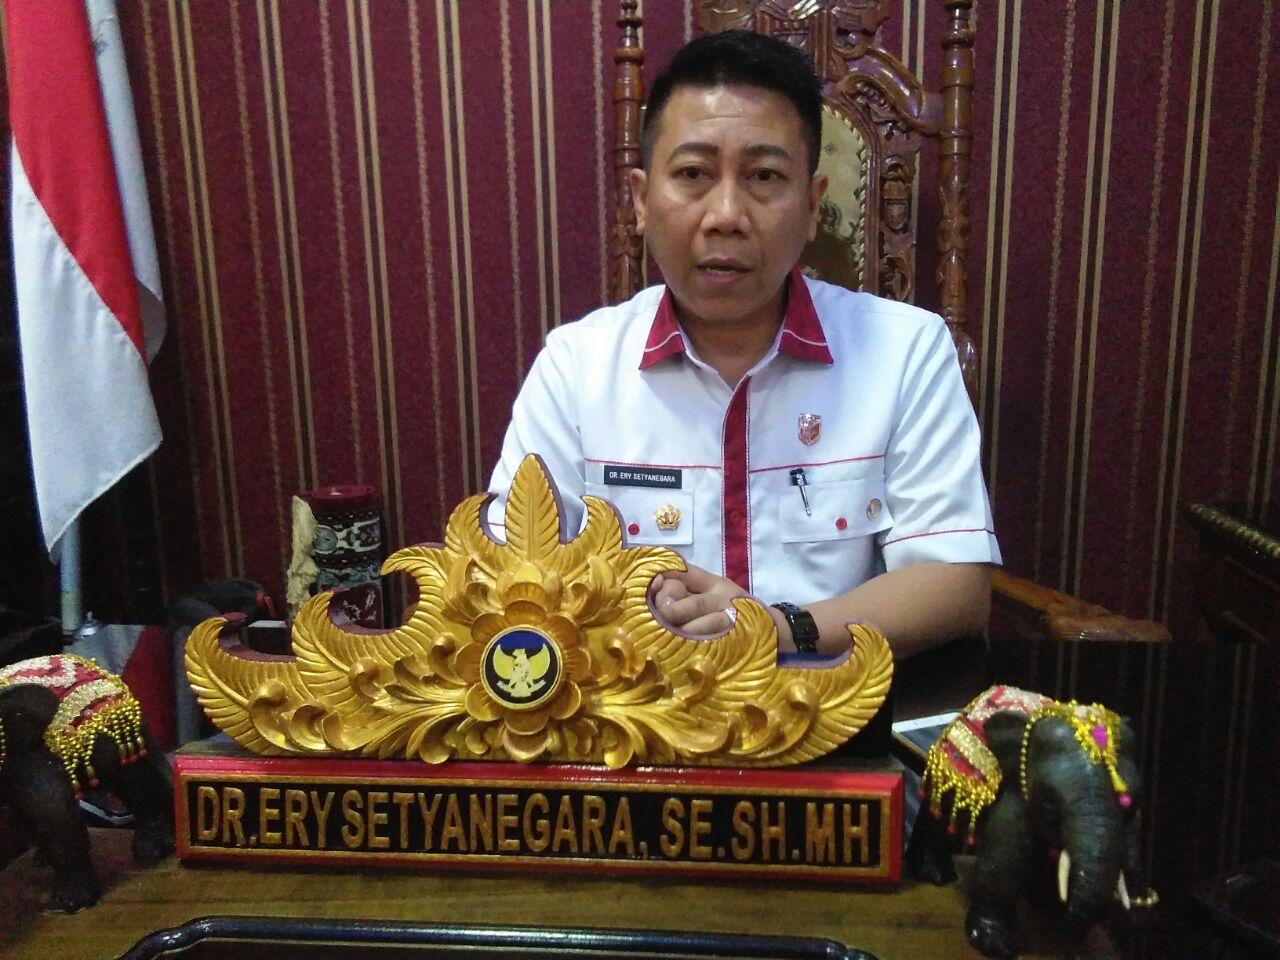 Verifikasi Faktual PKPI Lampung Belum Final